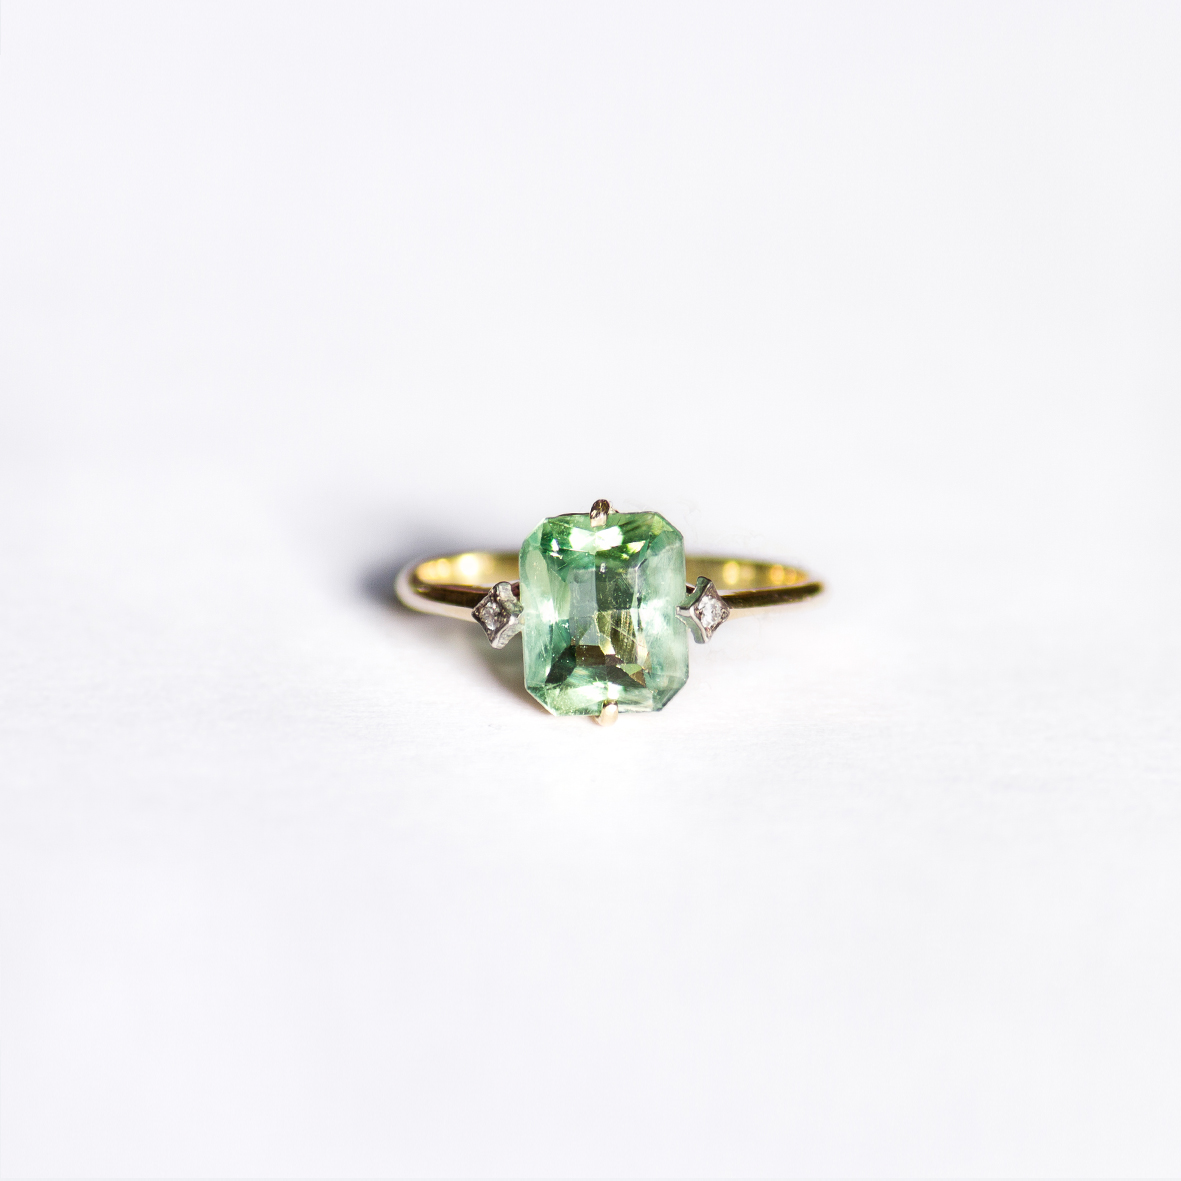 1. OONA_engagement_principal_zircon emerald ring copia